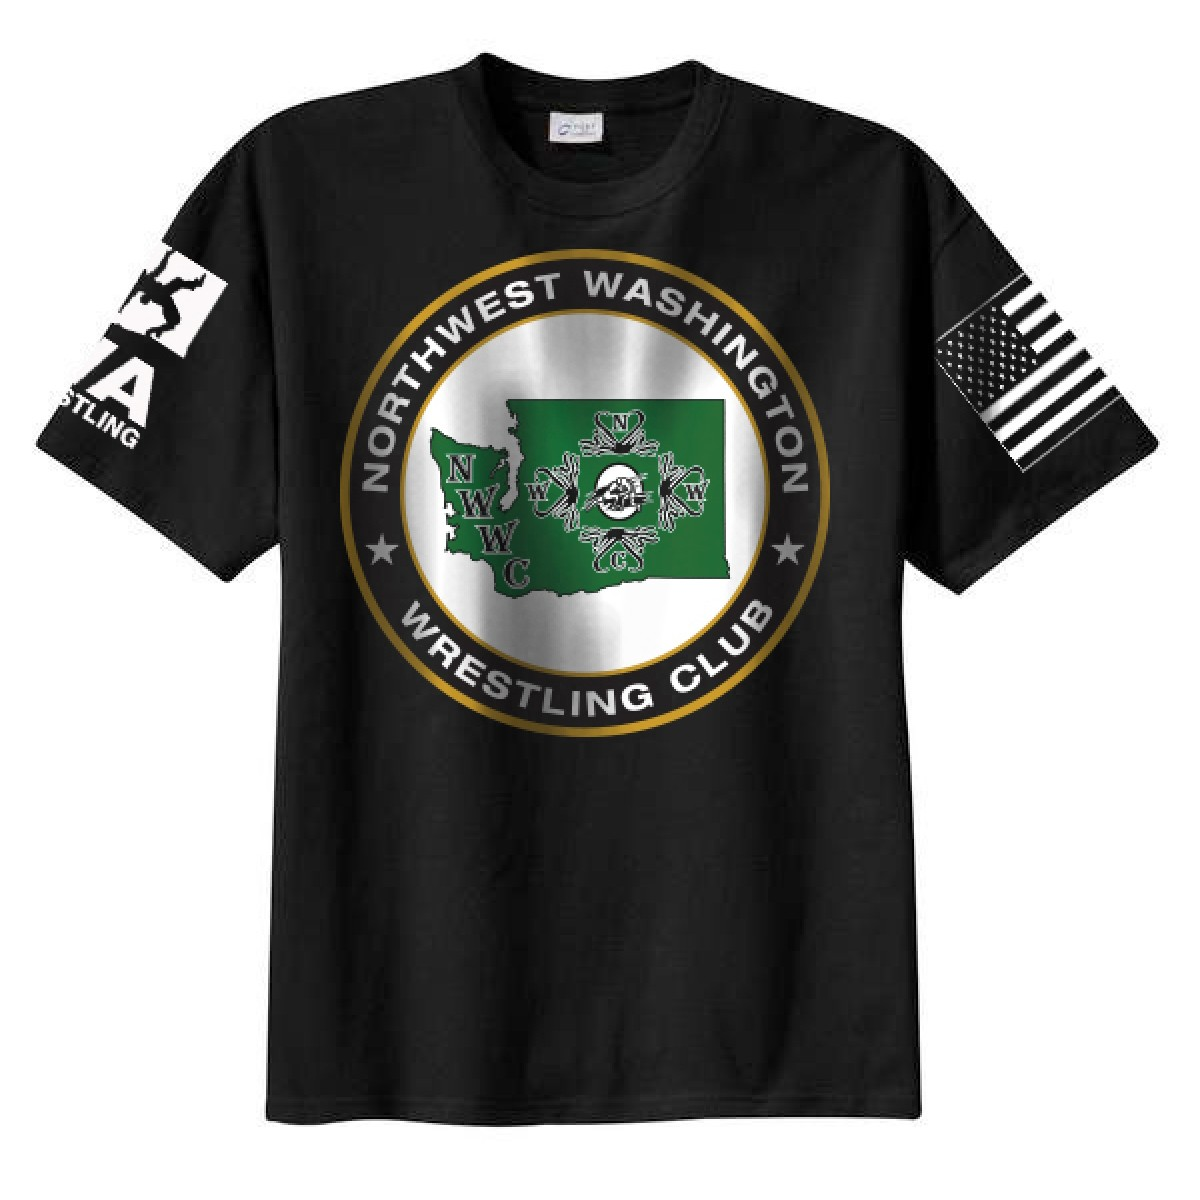 NWWC Black T-Shirt With Green Logo-Black-S